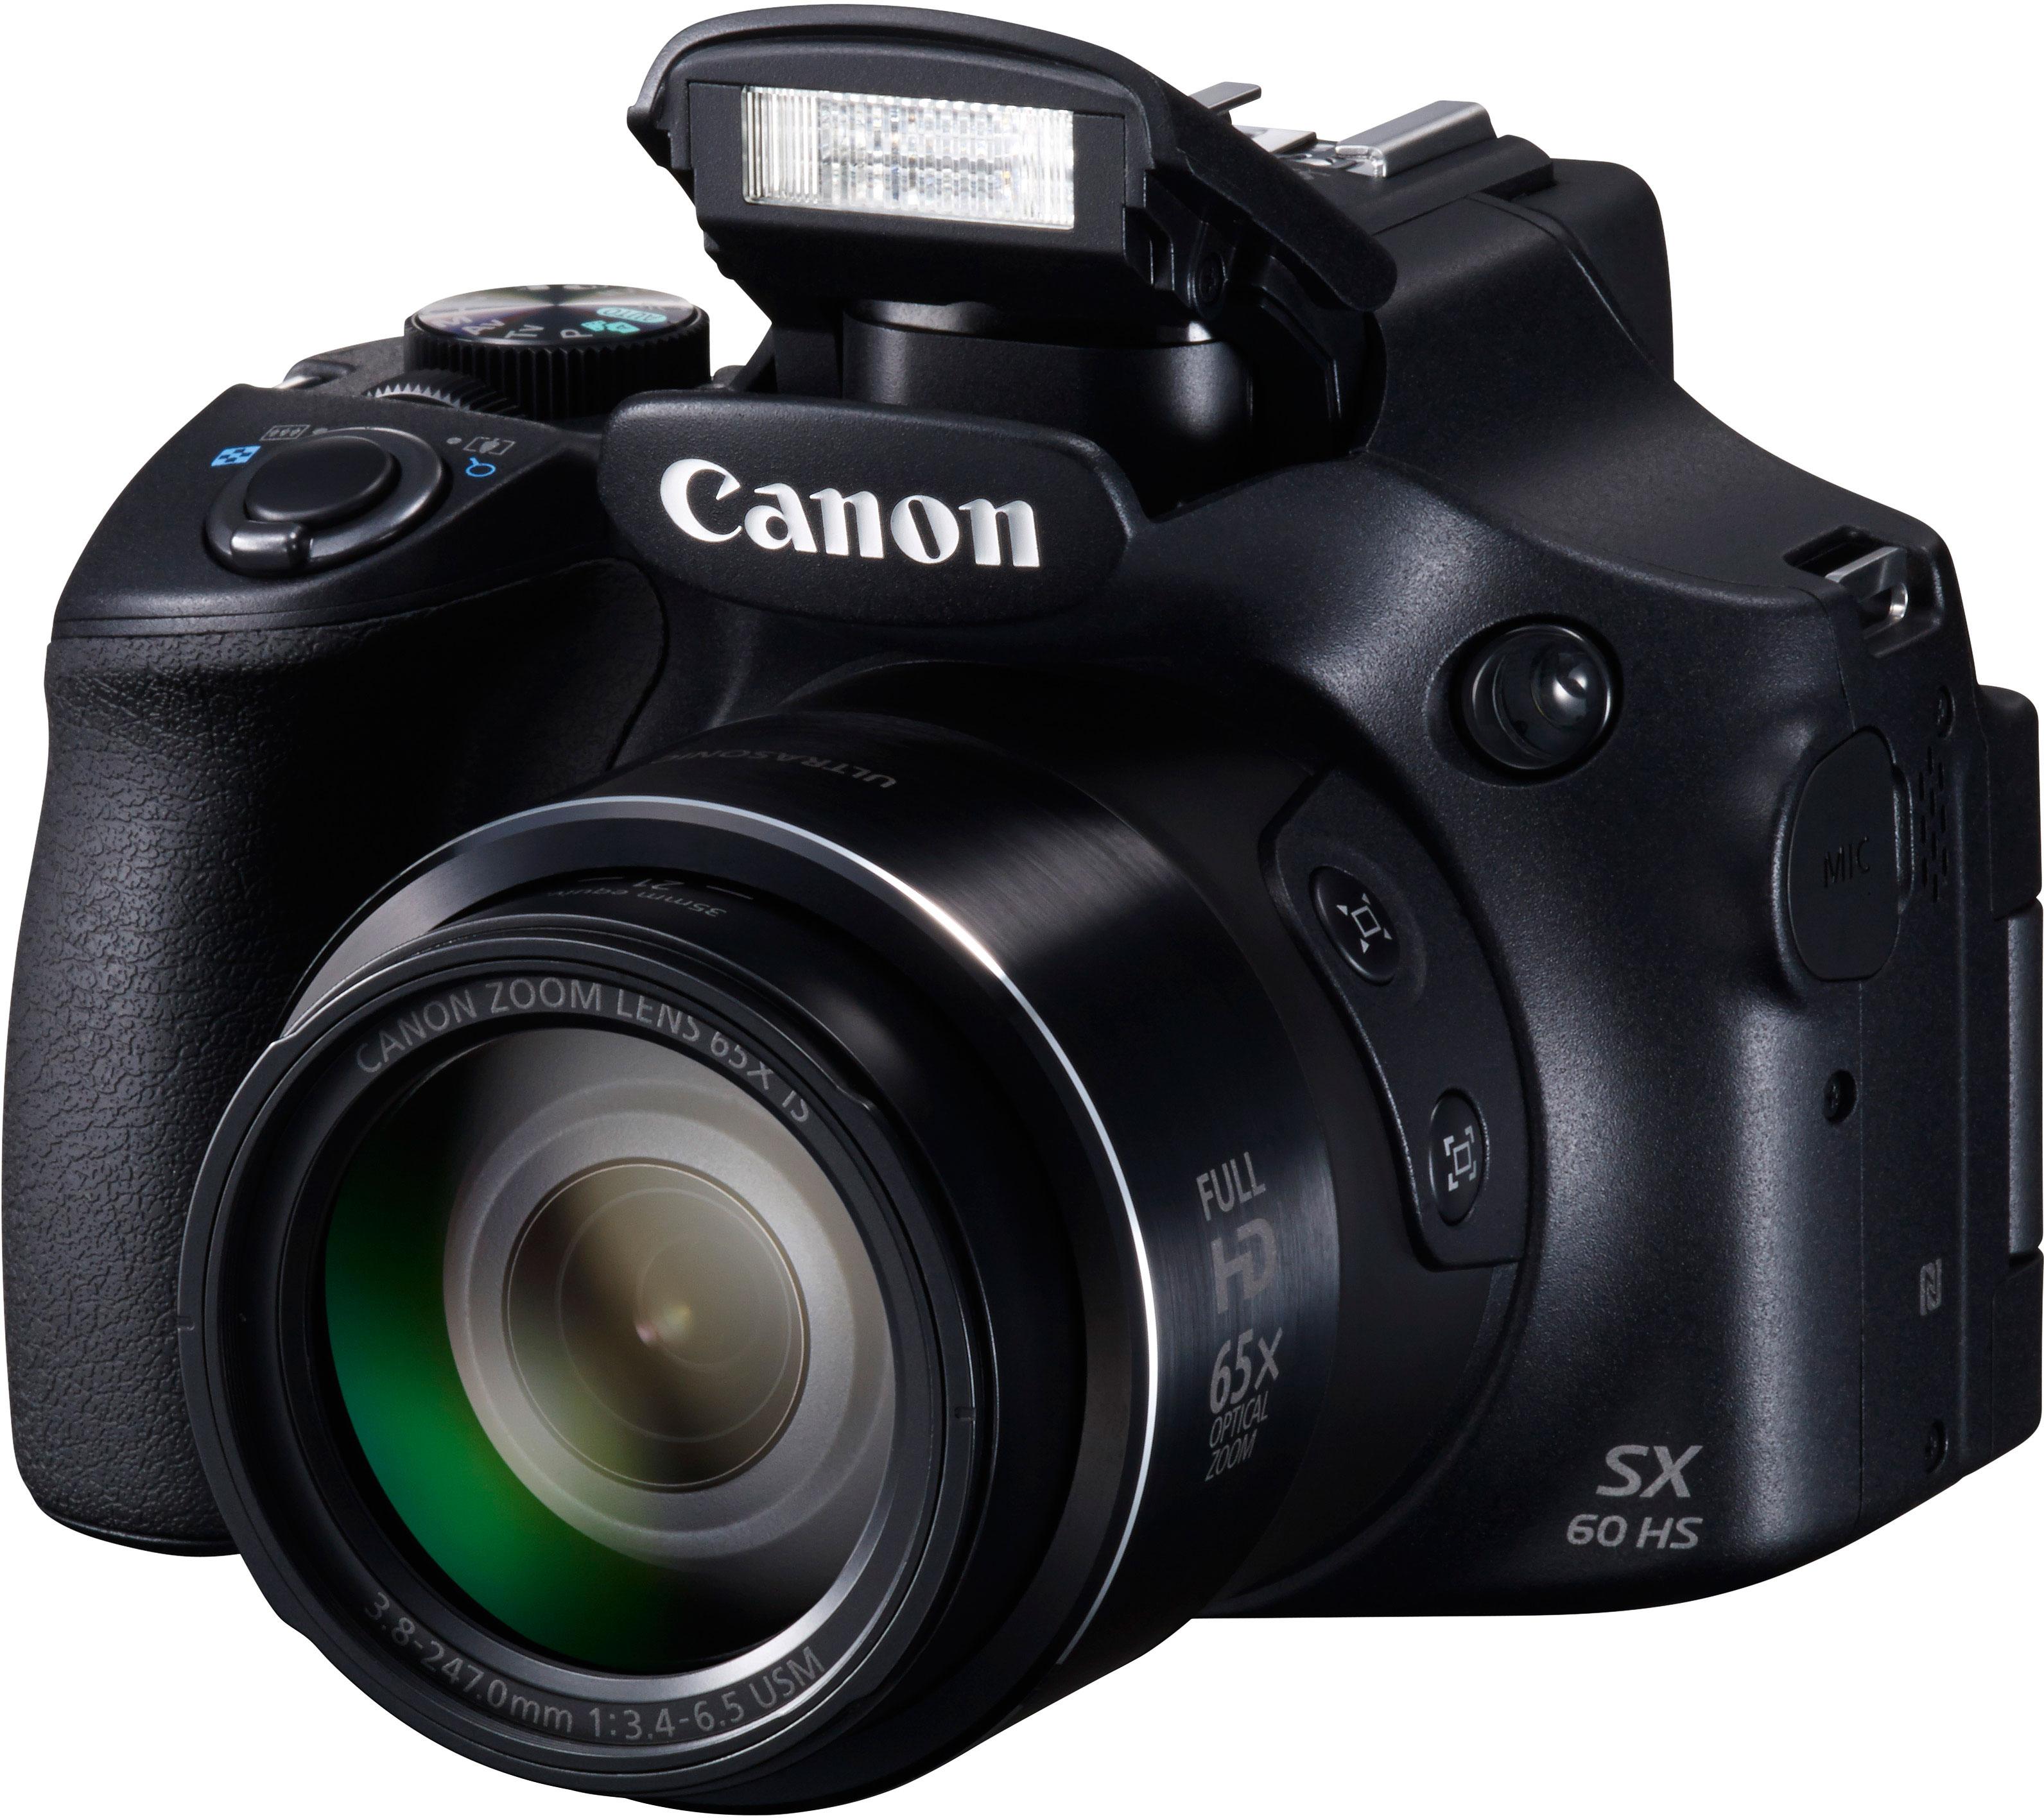 canon powershot camera cameras lineup digital three announced explora weight sx60 hs